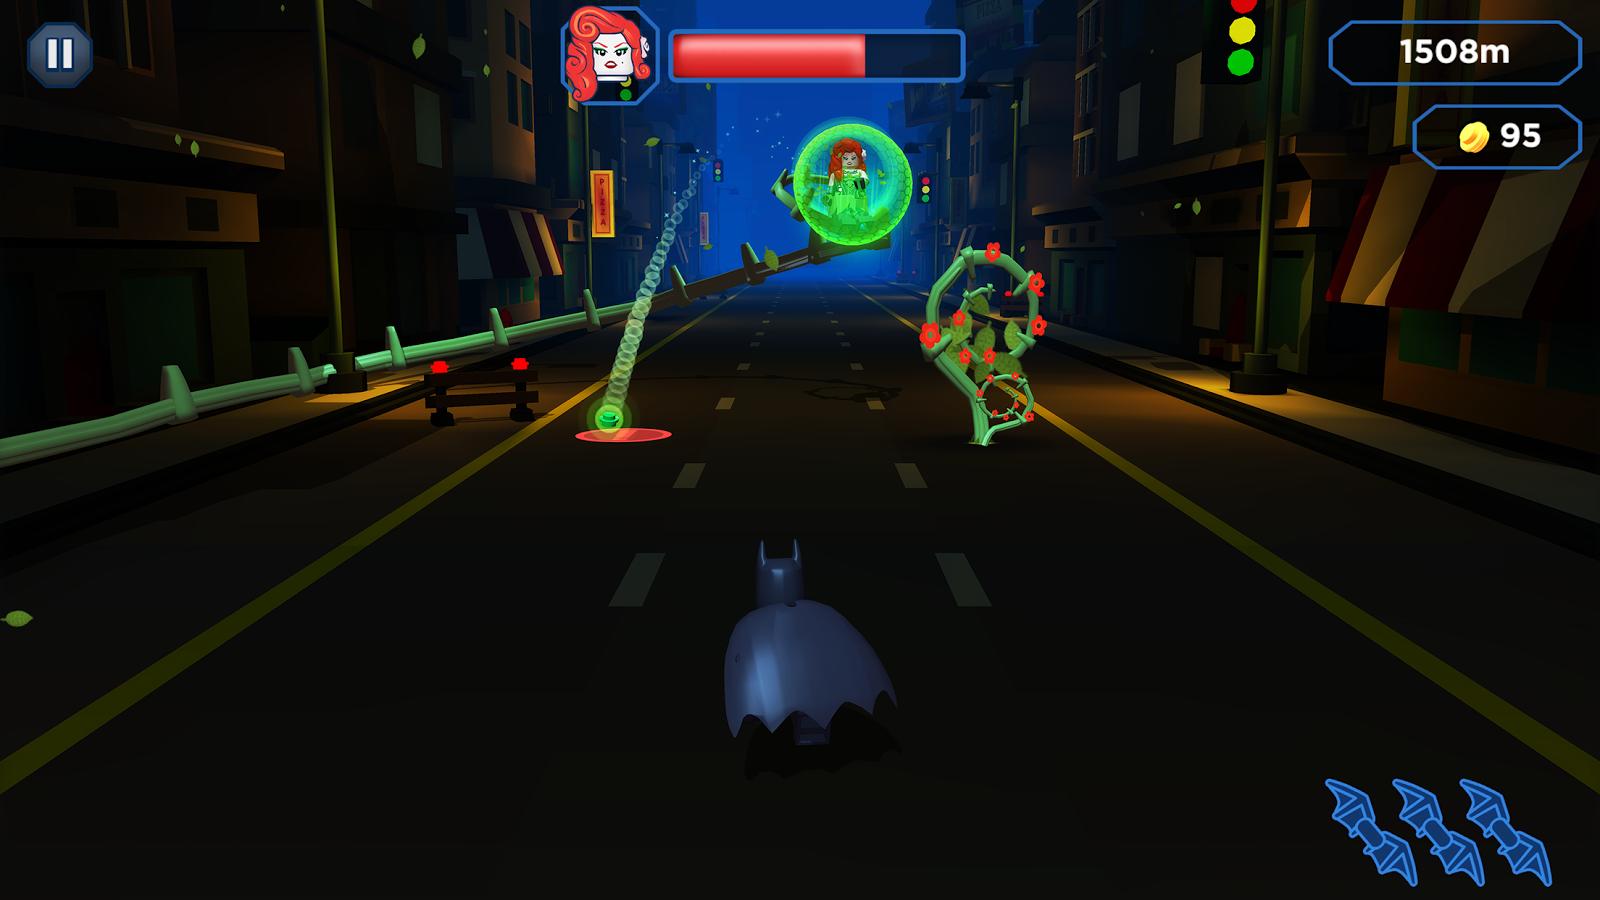 lego batman 2 android